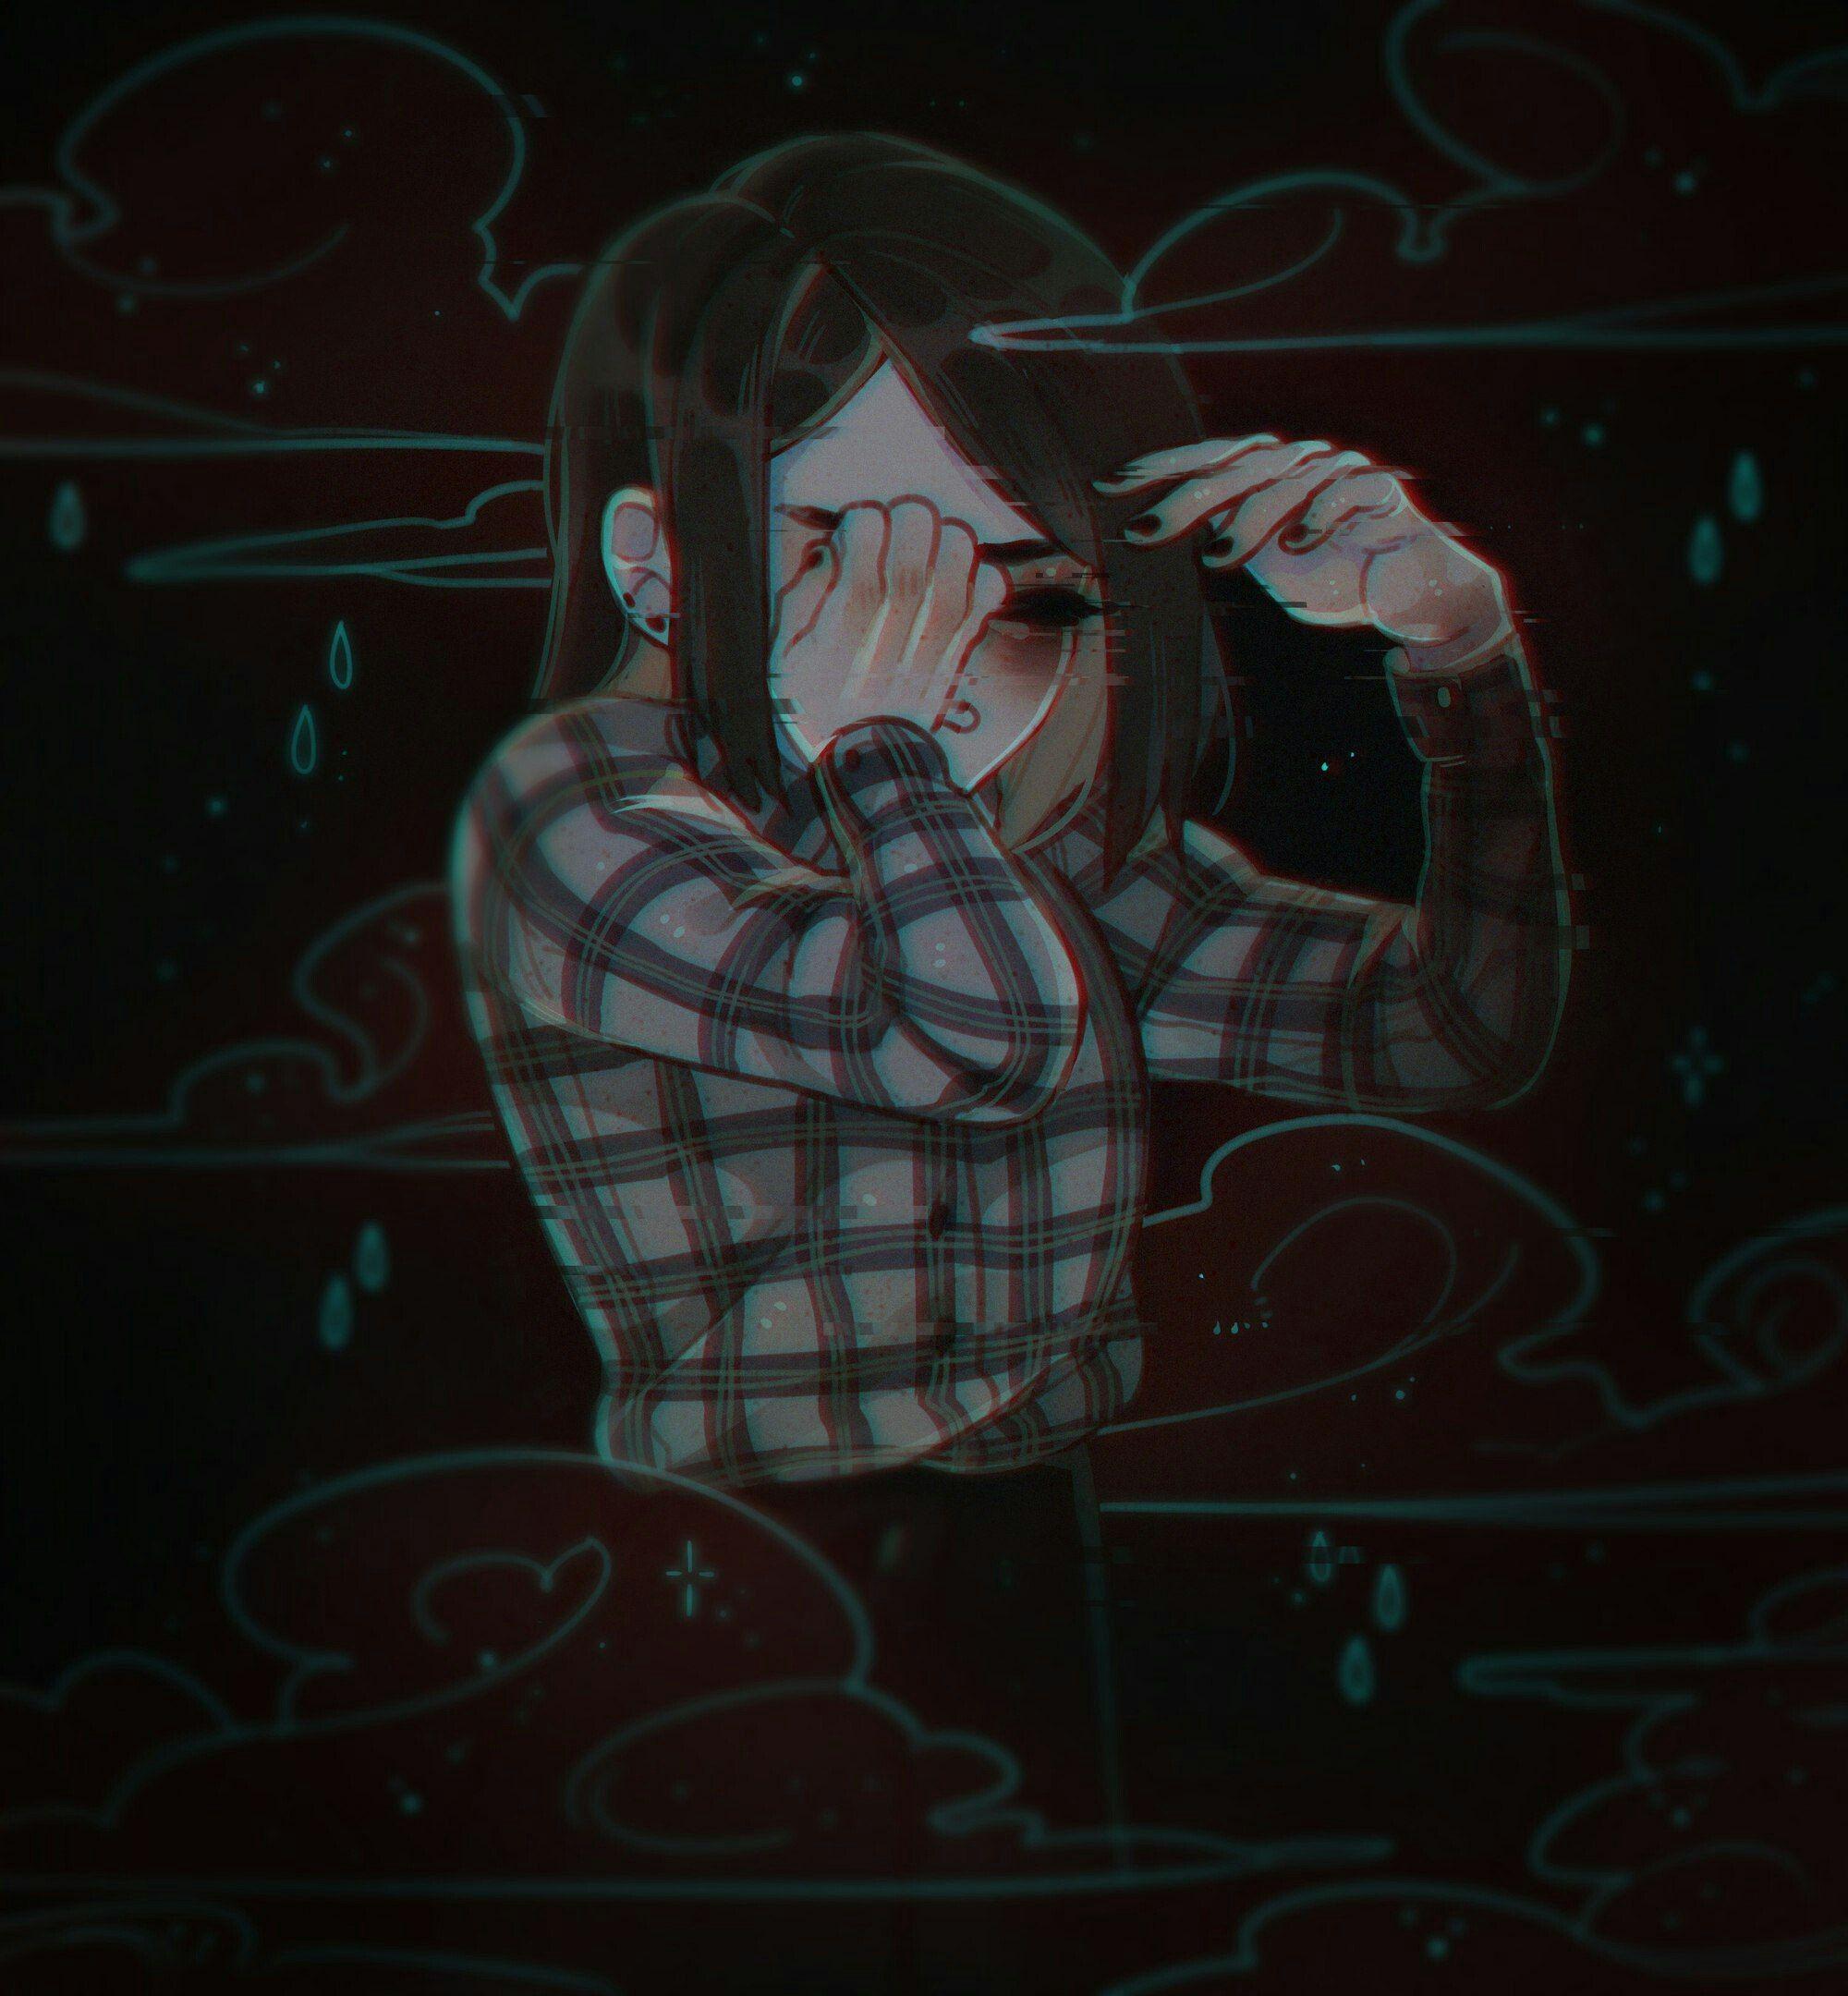 Sad Anime Aesthetic Girl